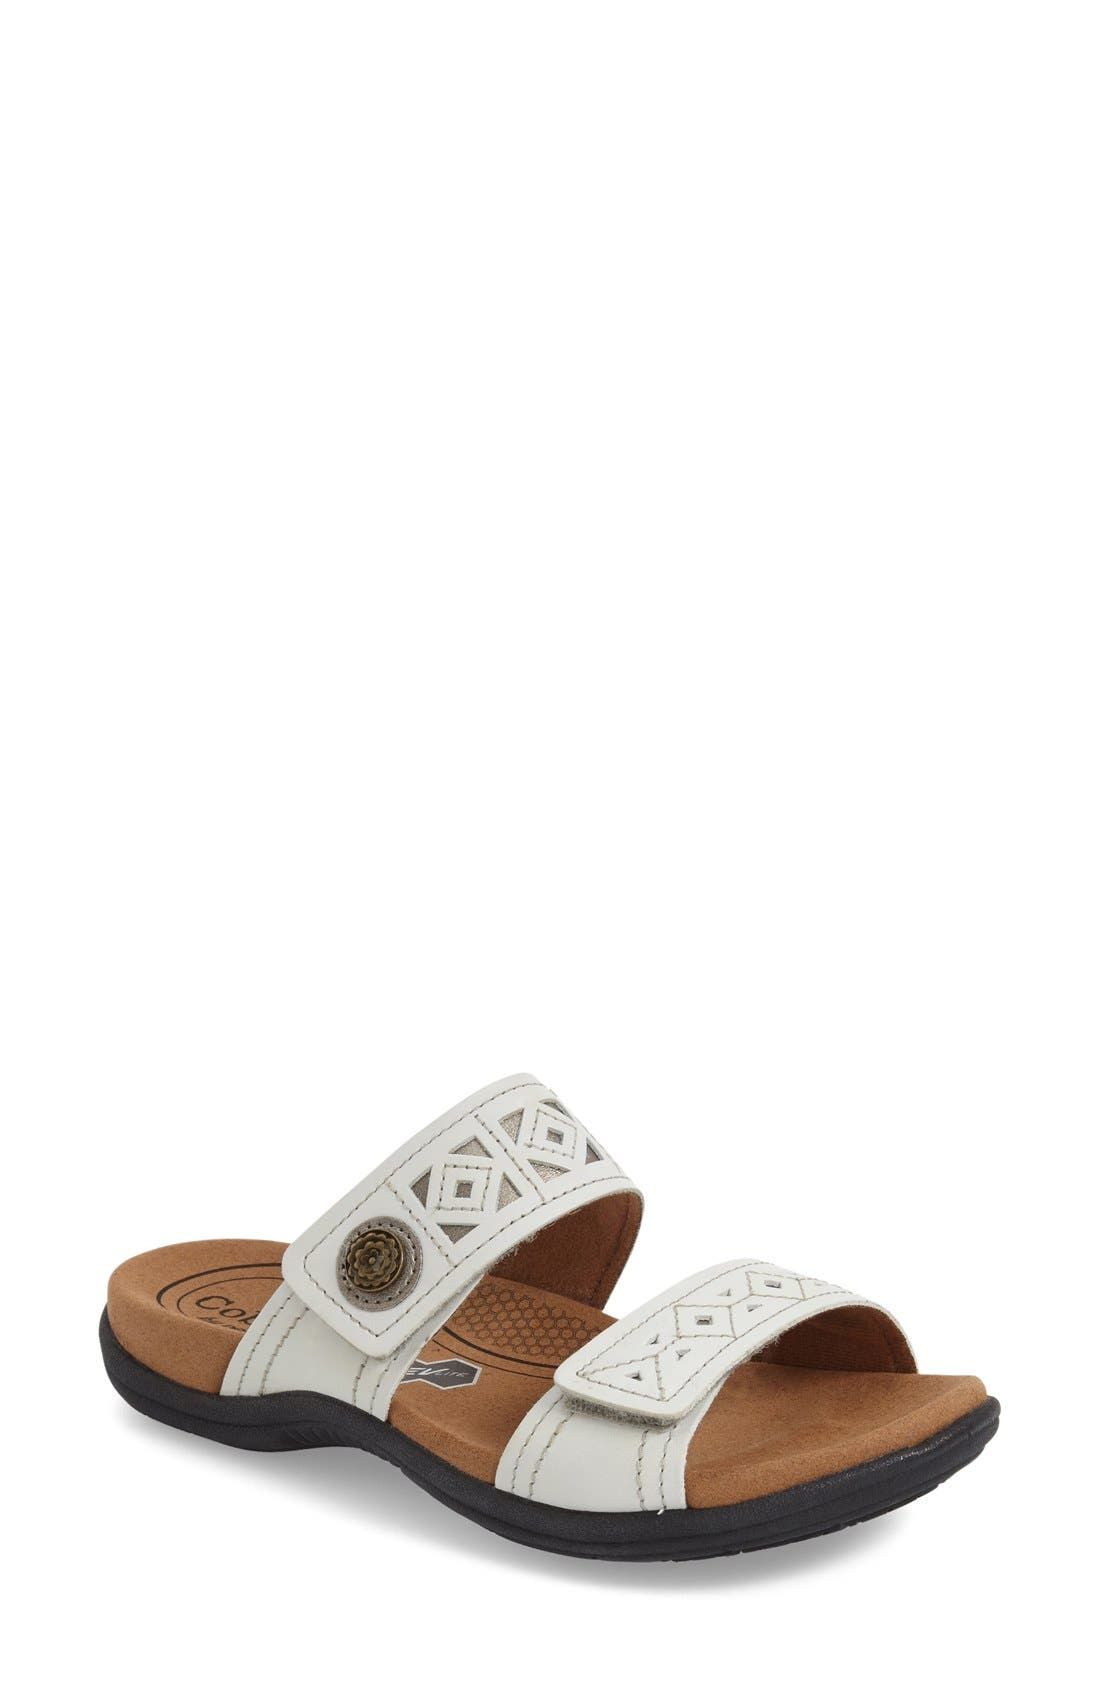 Main Image - Rockport Cobb Hill REVsoul Two Strap Sandal (Women)